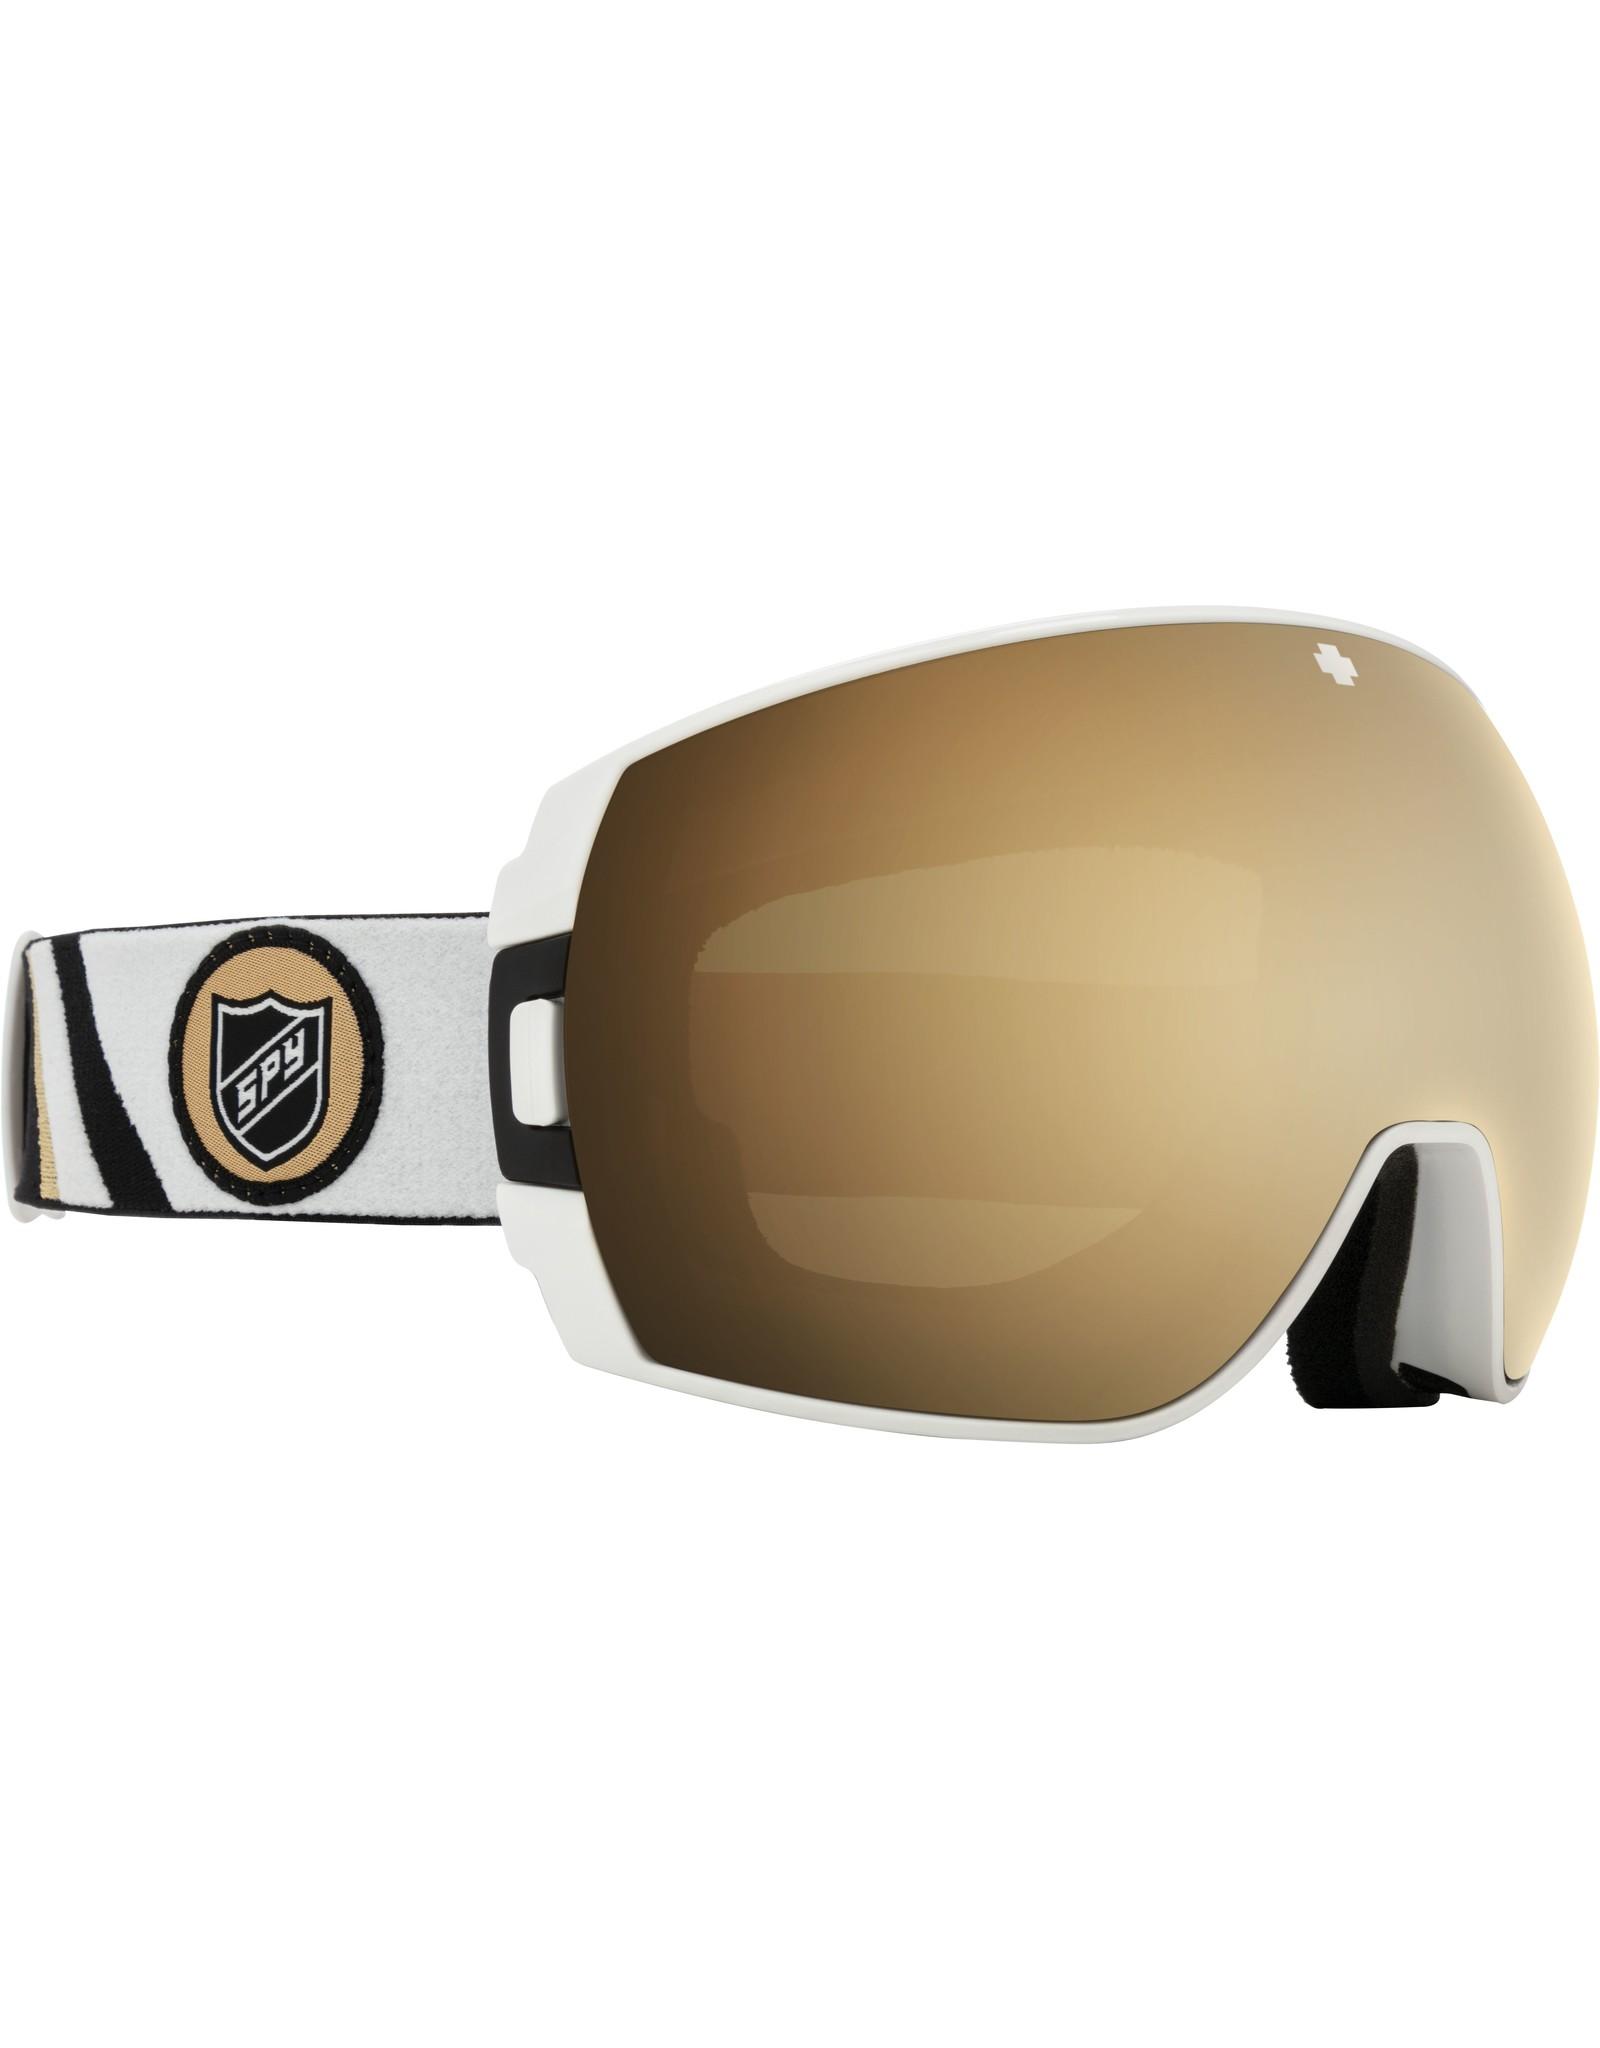 SPY SPY - LEGACY - WALLISCH HD - BRONZE/GOLD SPECTRA + BONUS LENS